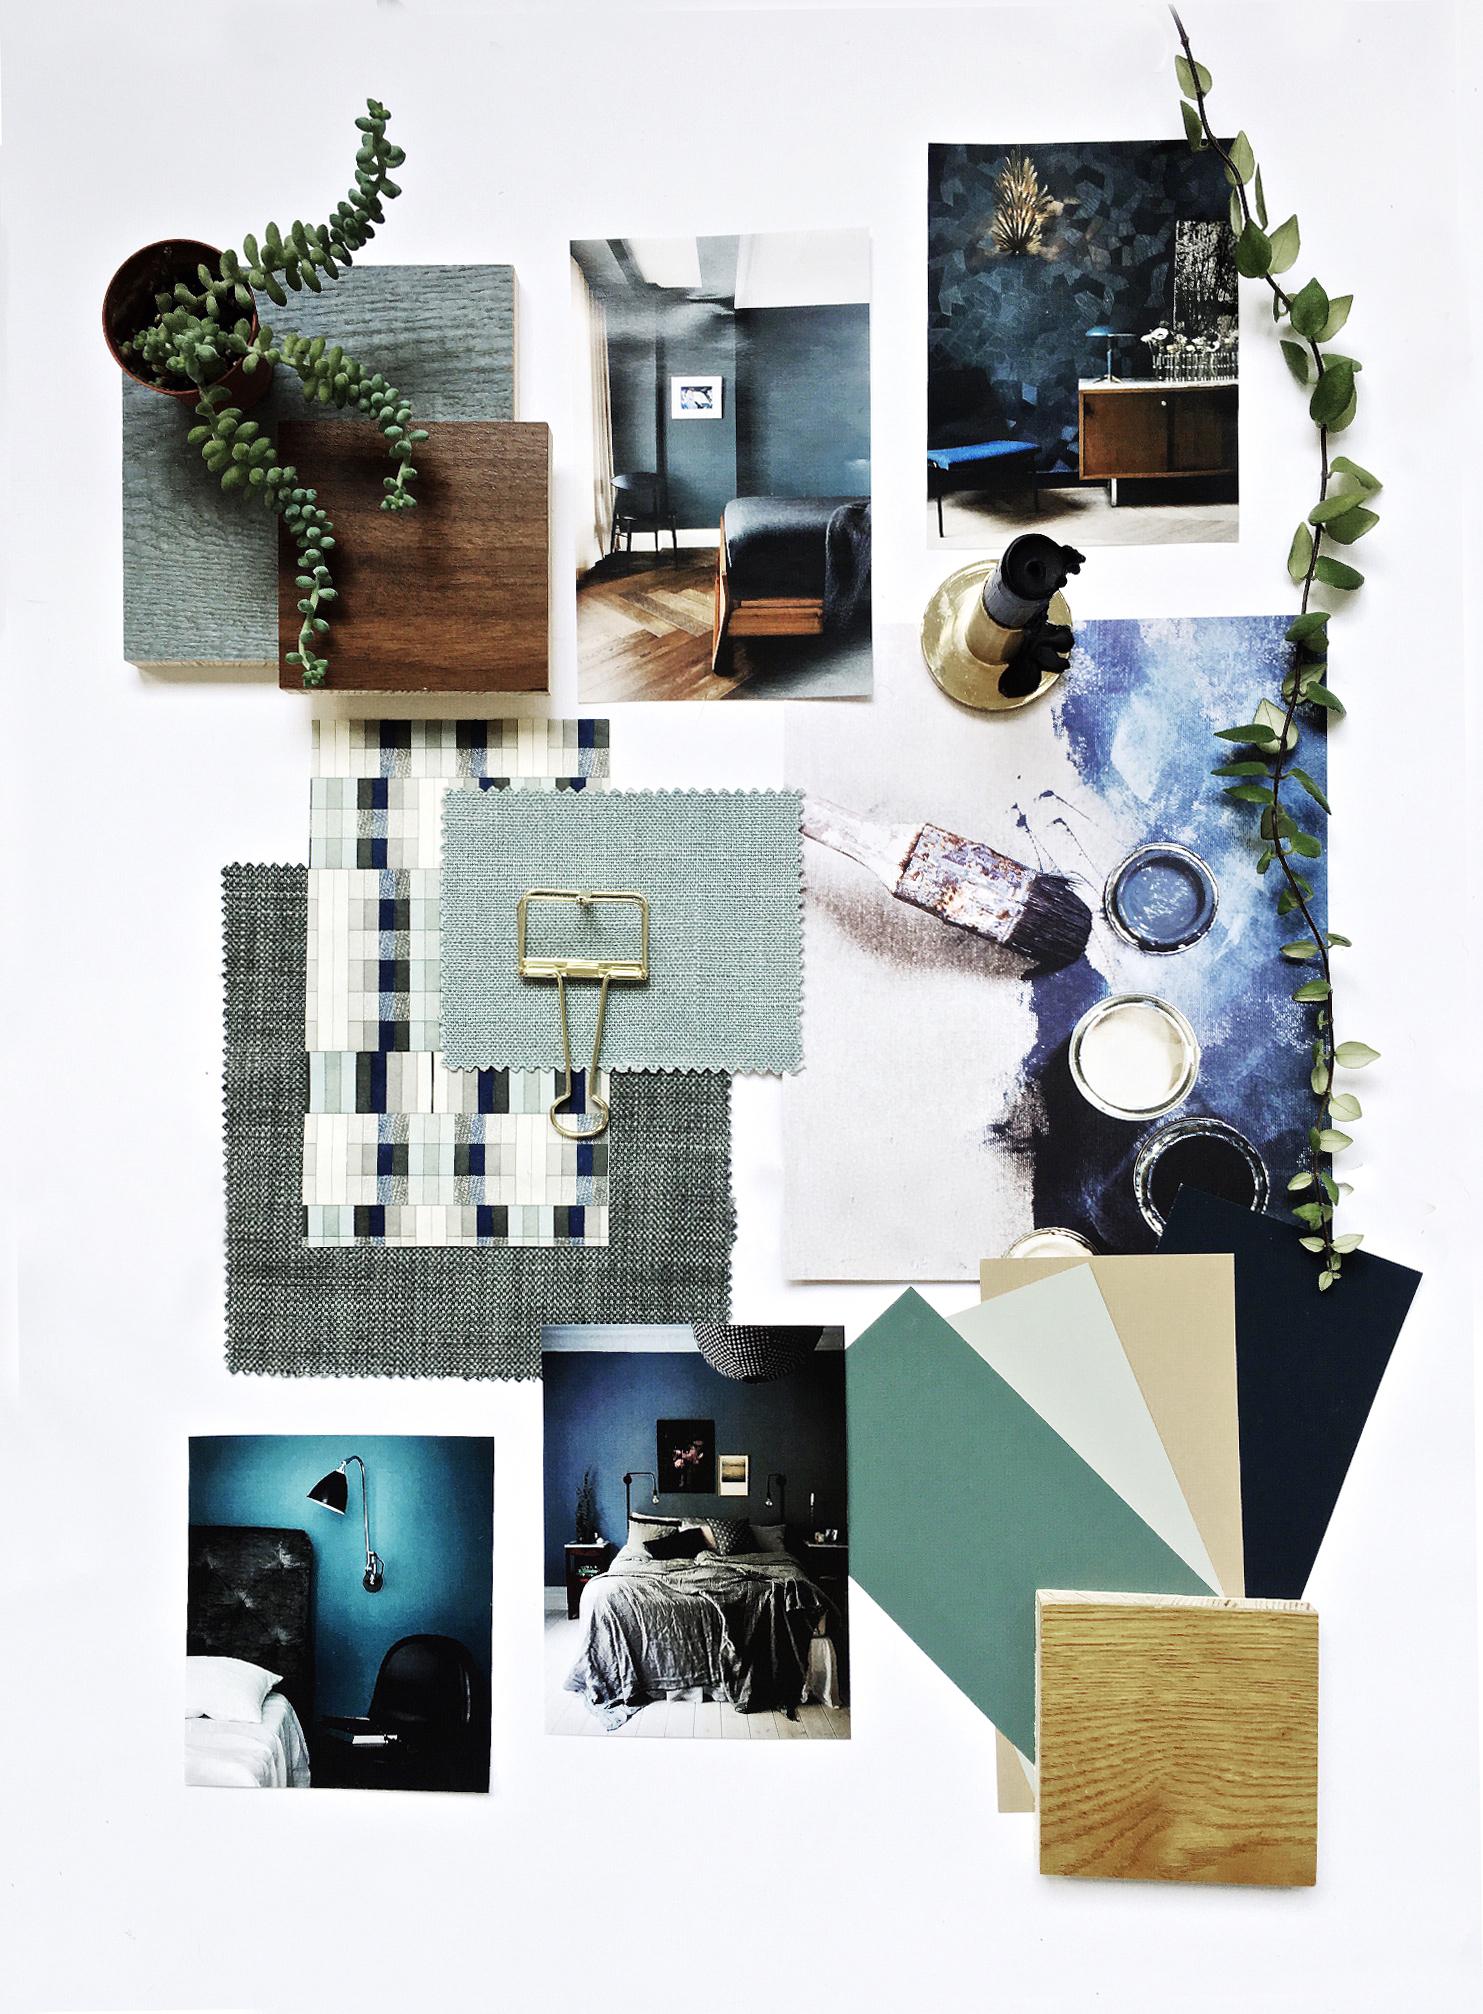 https://tachecreativedesign.com/wp-content/uploads/2021/09/Mood-Board-Moody-Bedroom-EclecticTrends-1.jpg